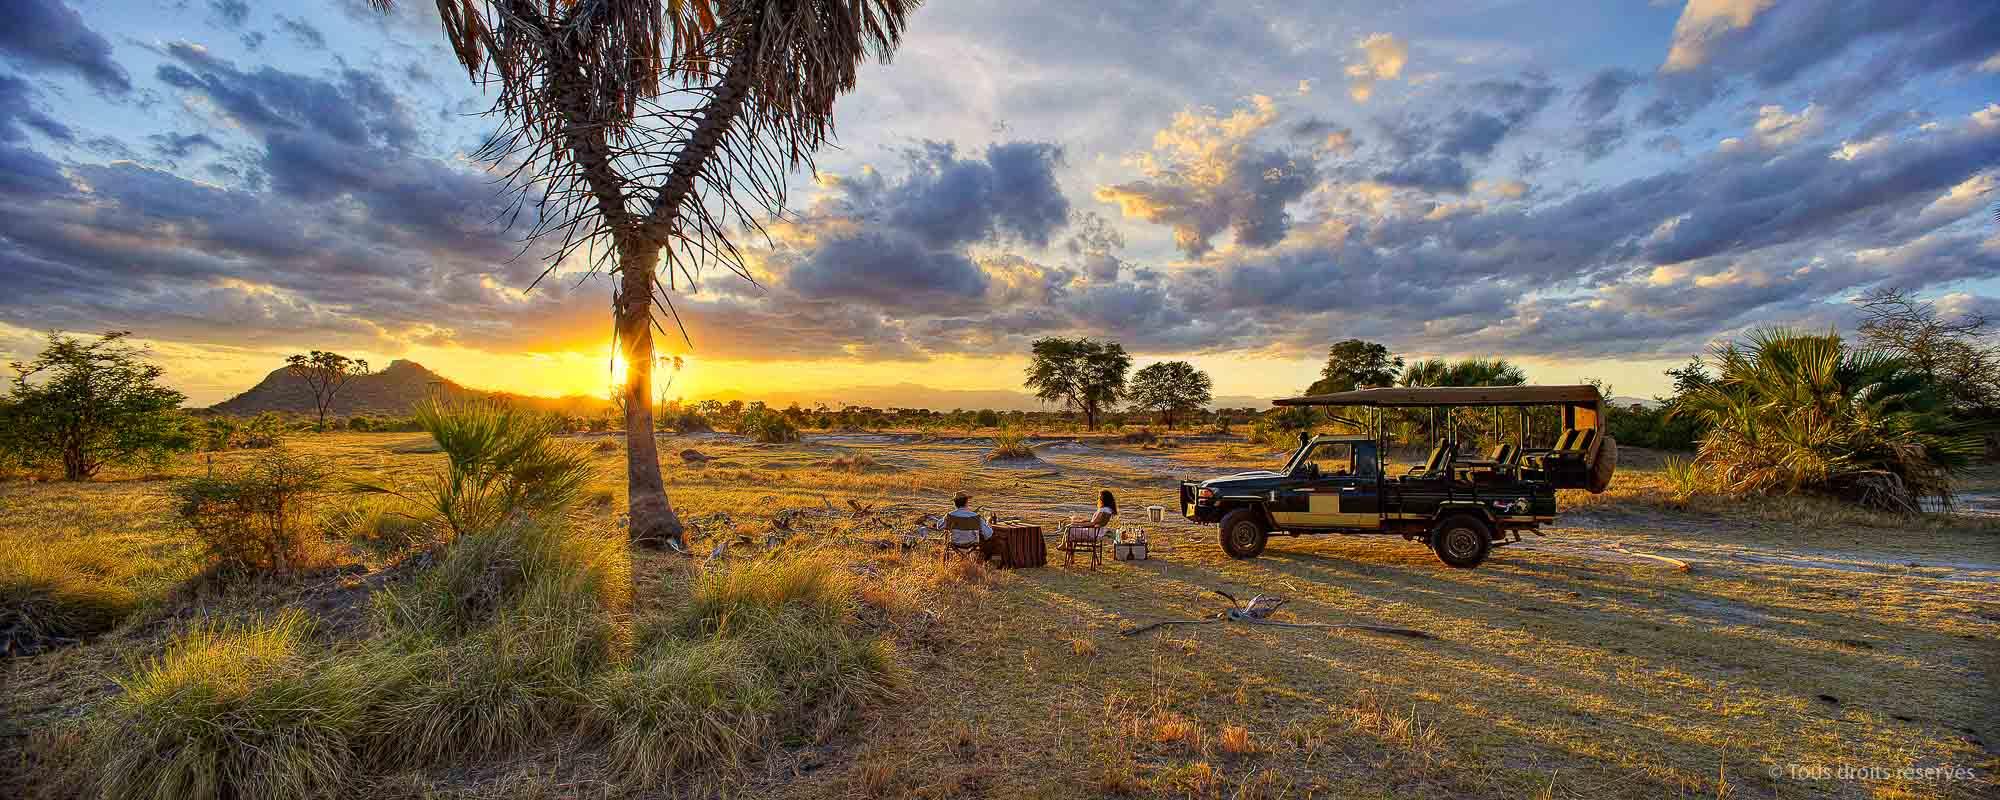 Kenya plus grand site de rencontre